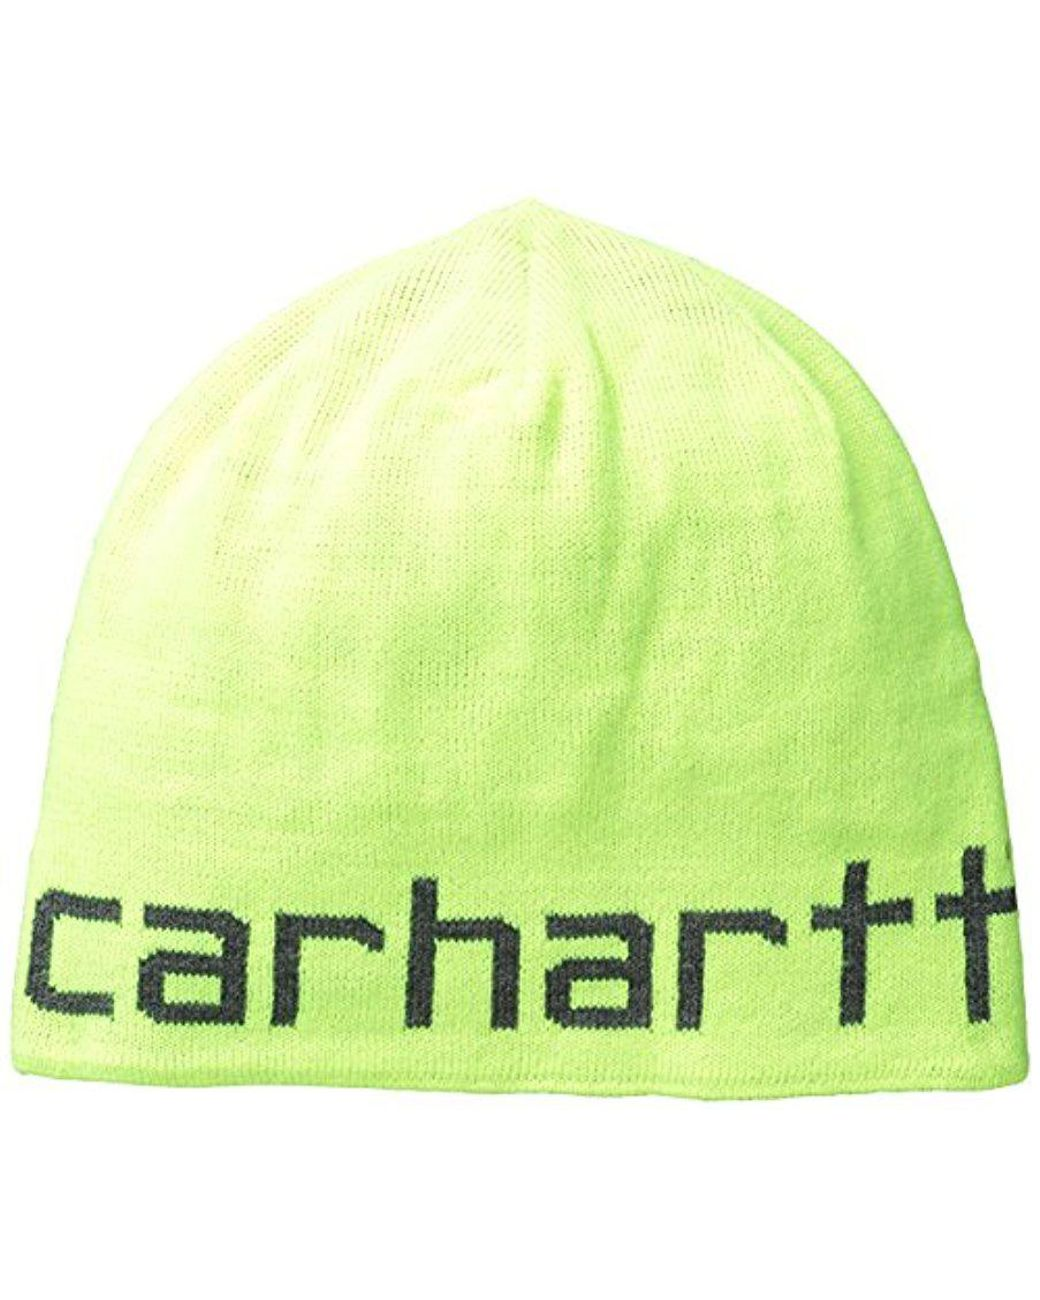 e1facf00d Men's Greenfield Reversible Hat